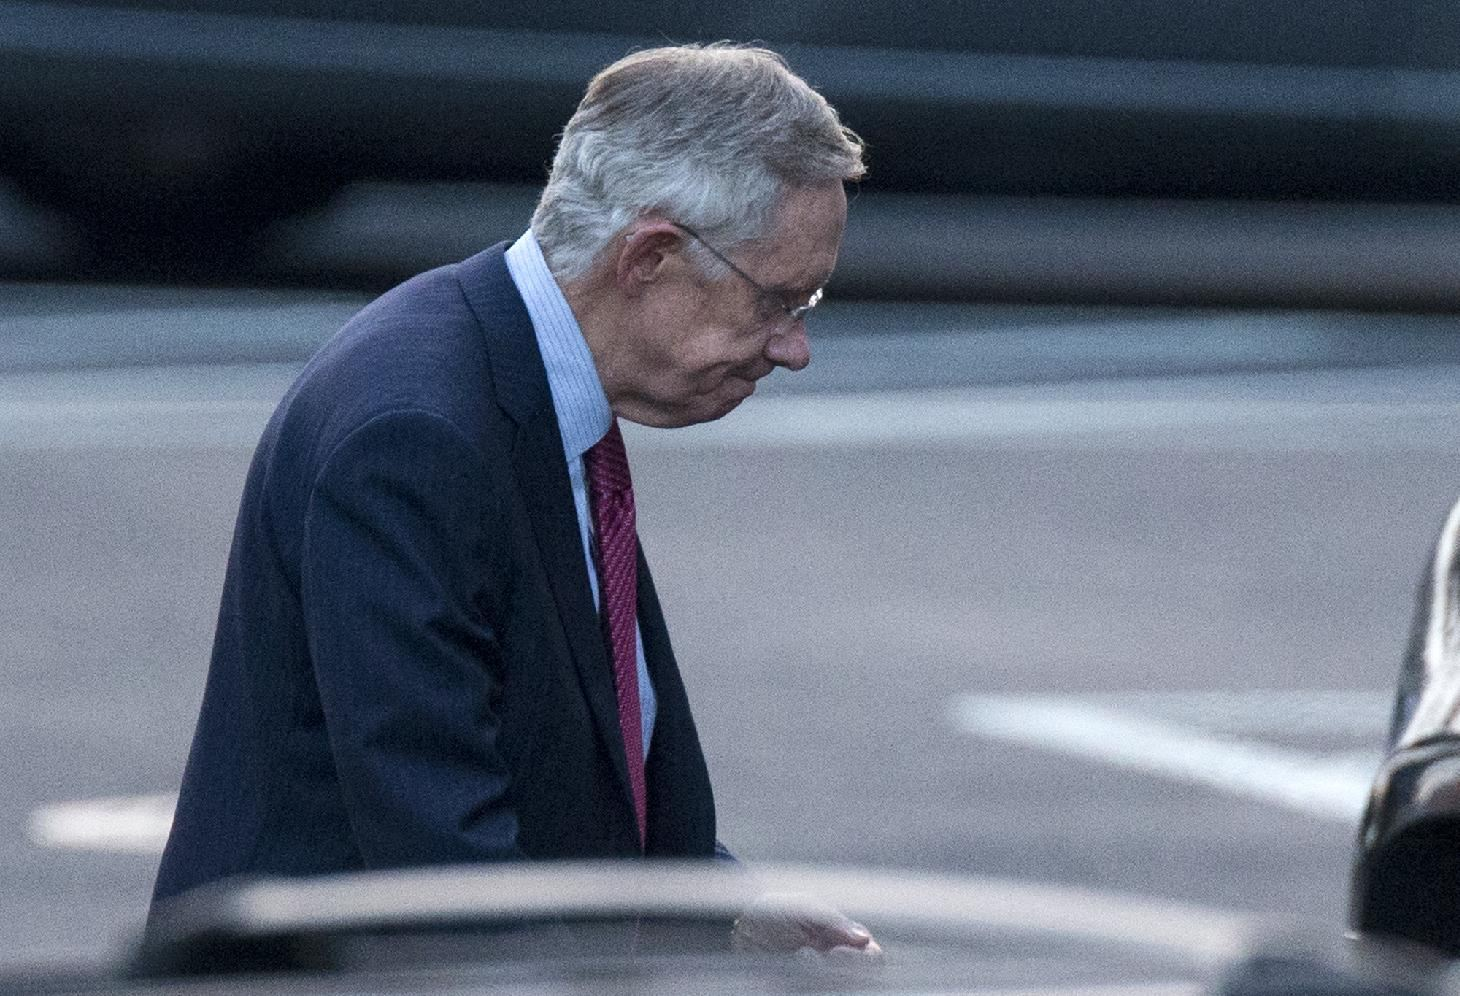 Senate Majority Leader Harry Reid of Nev. leaves the White House in Washington, Friday.  (AP Photo/ Evan Vucci)